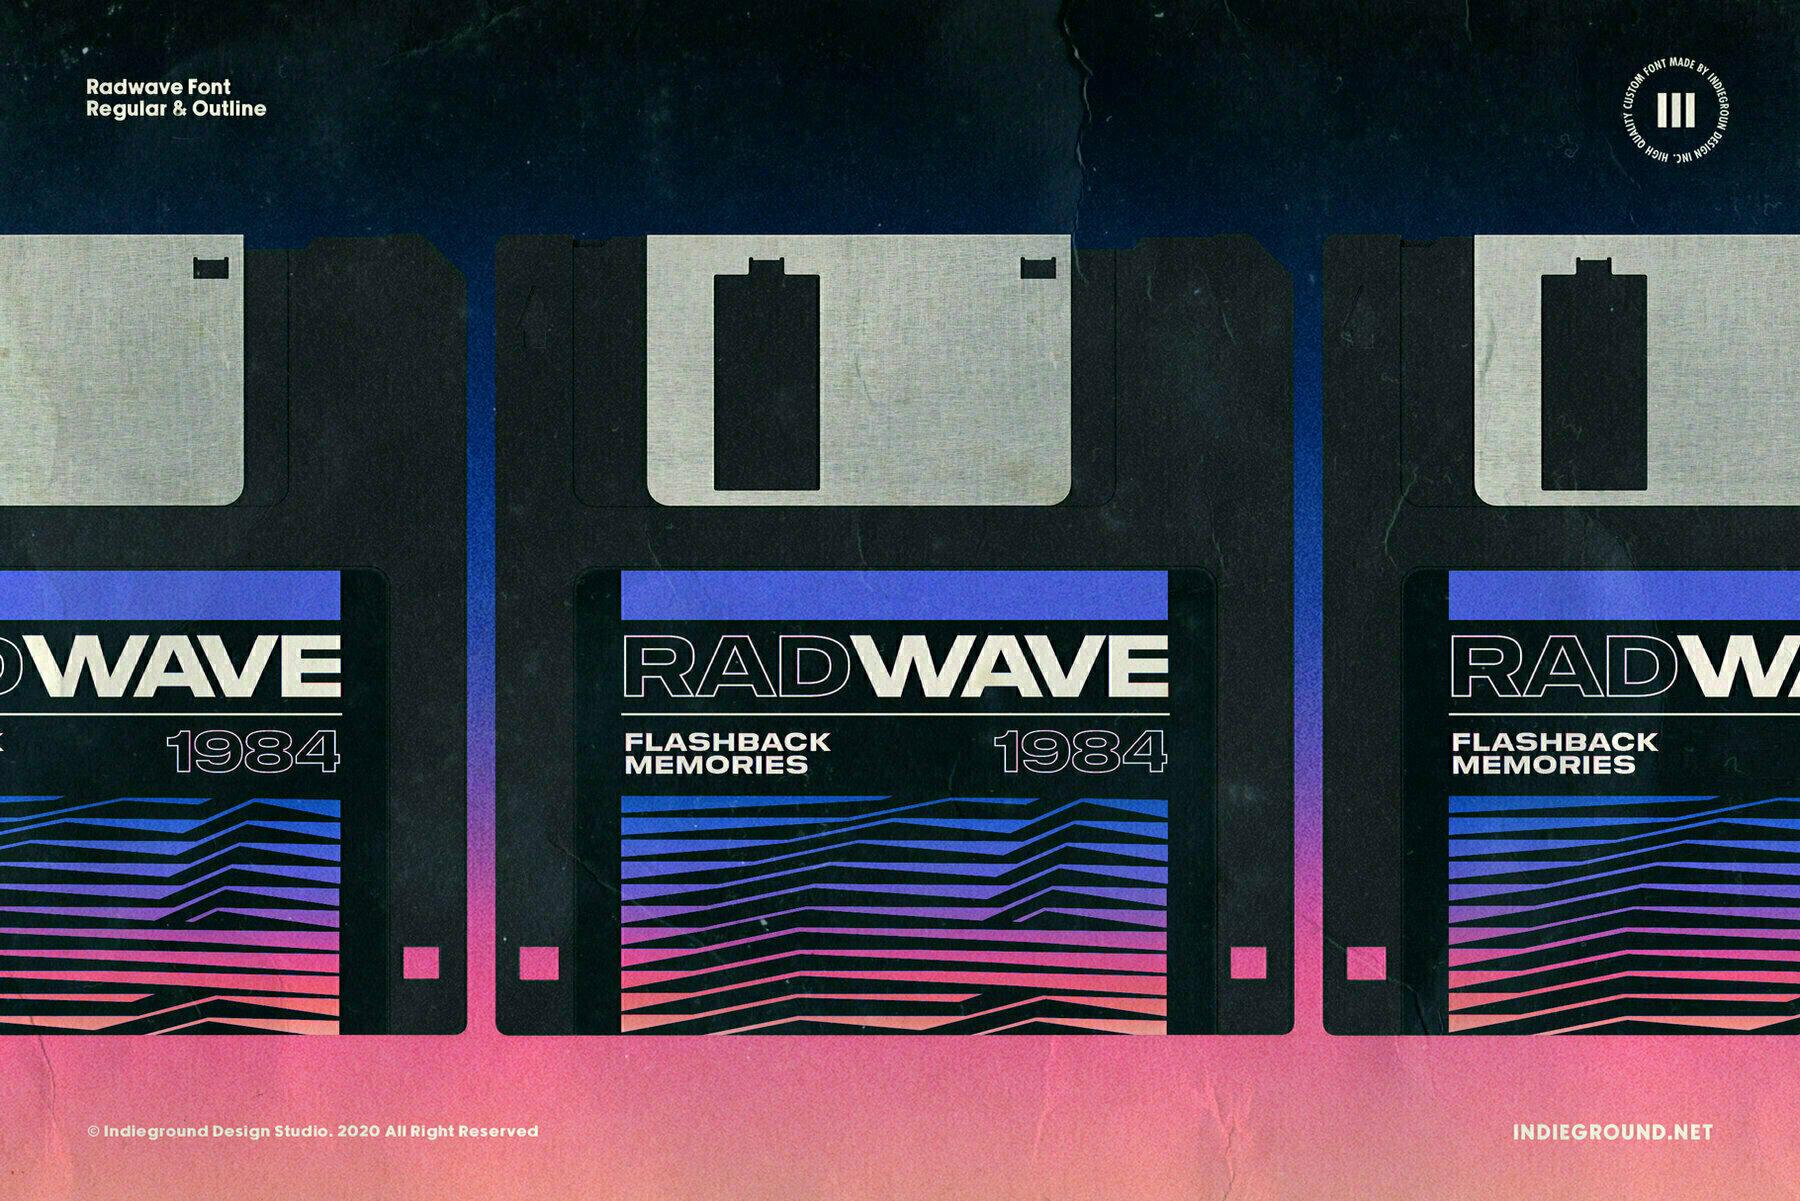 Radwave